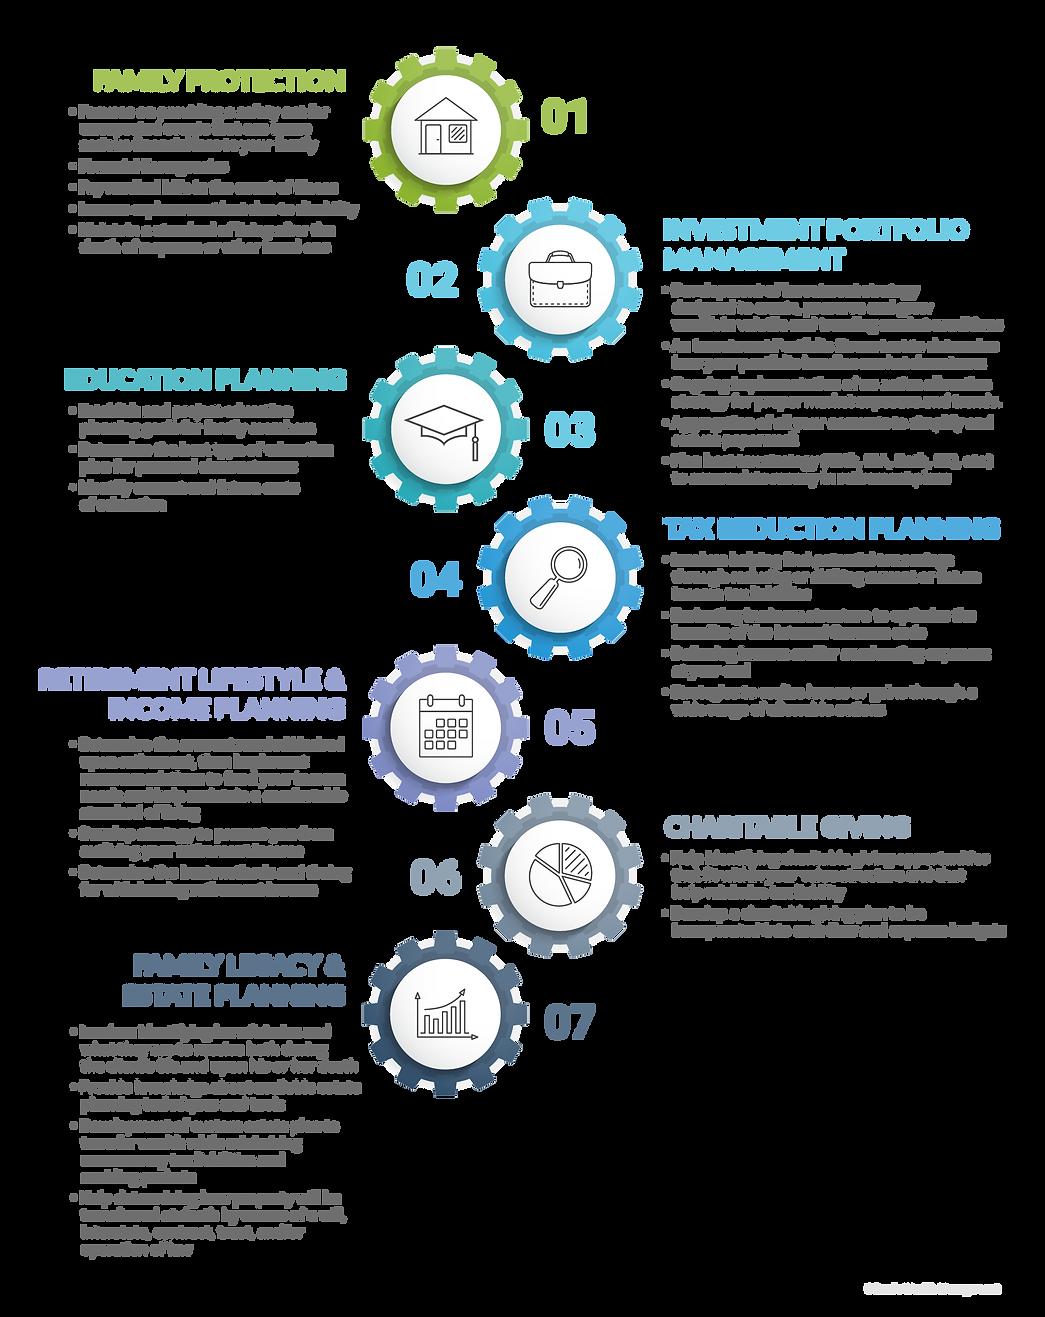 040719_FWM_Services_Infographic150-01.pn